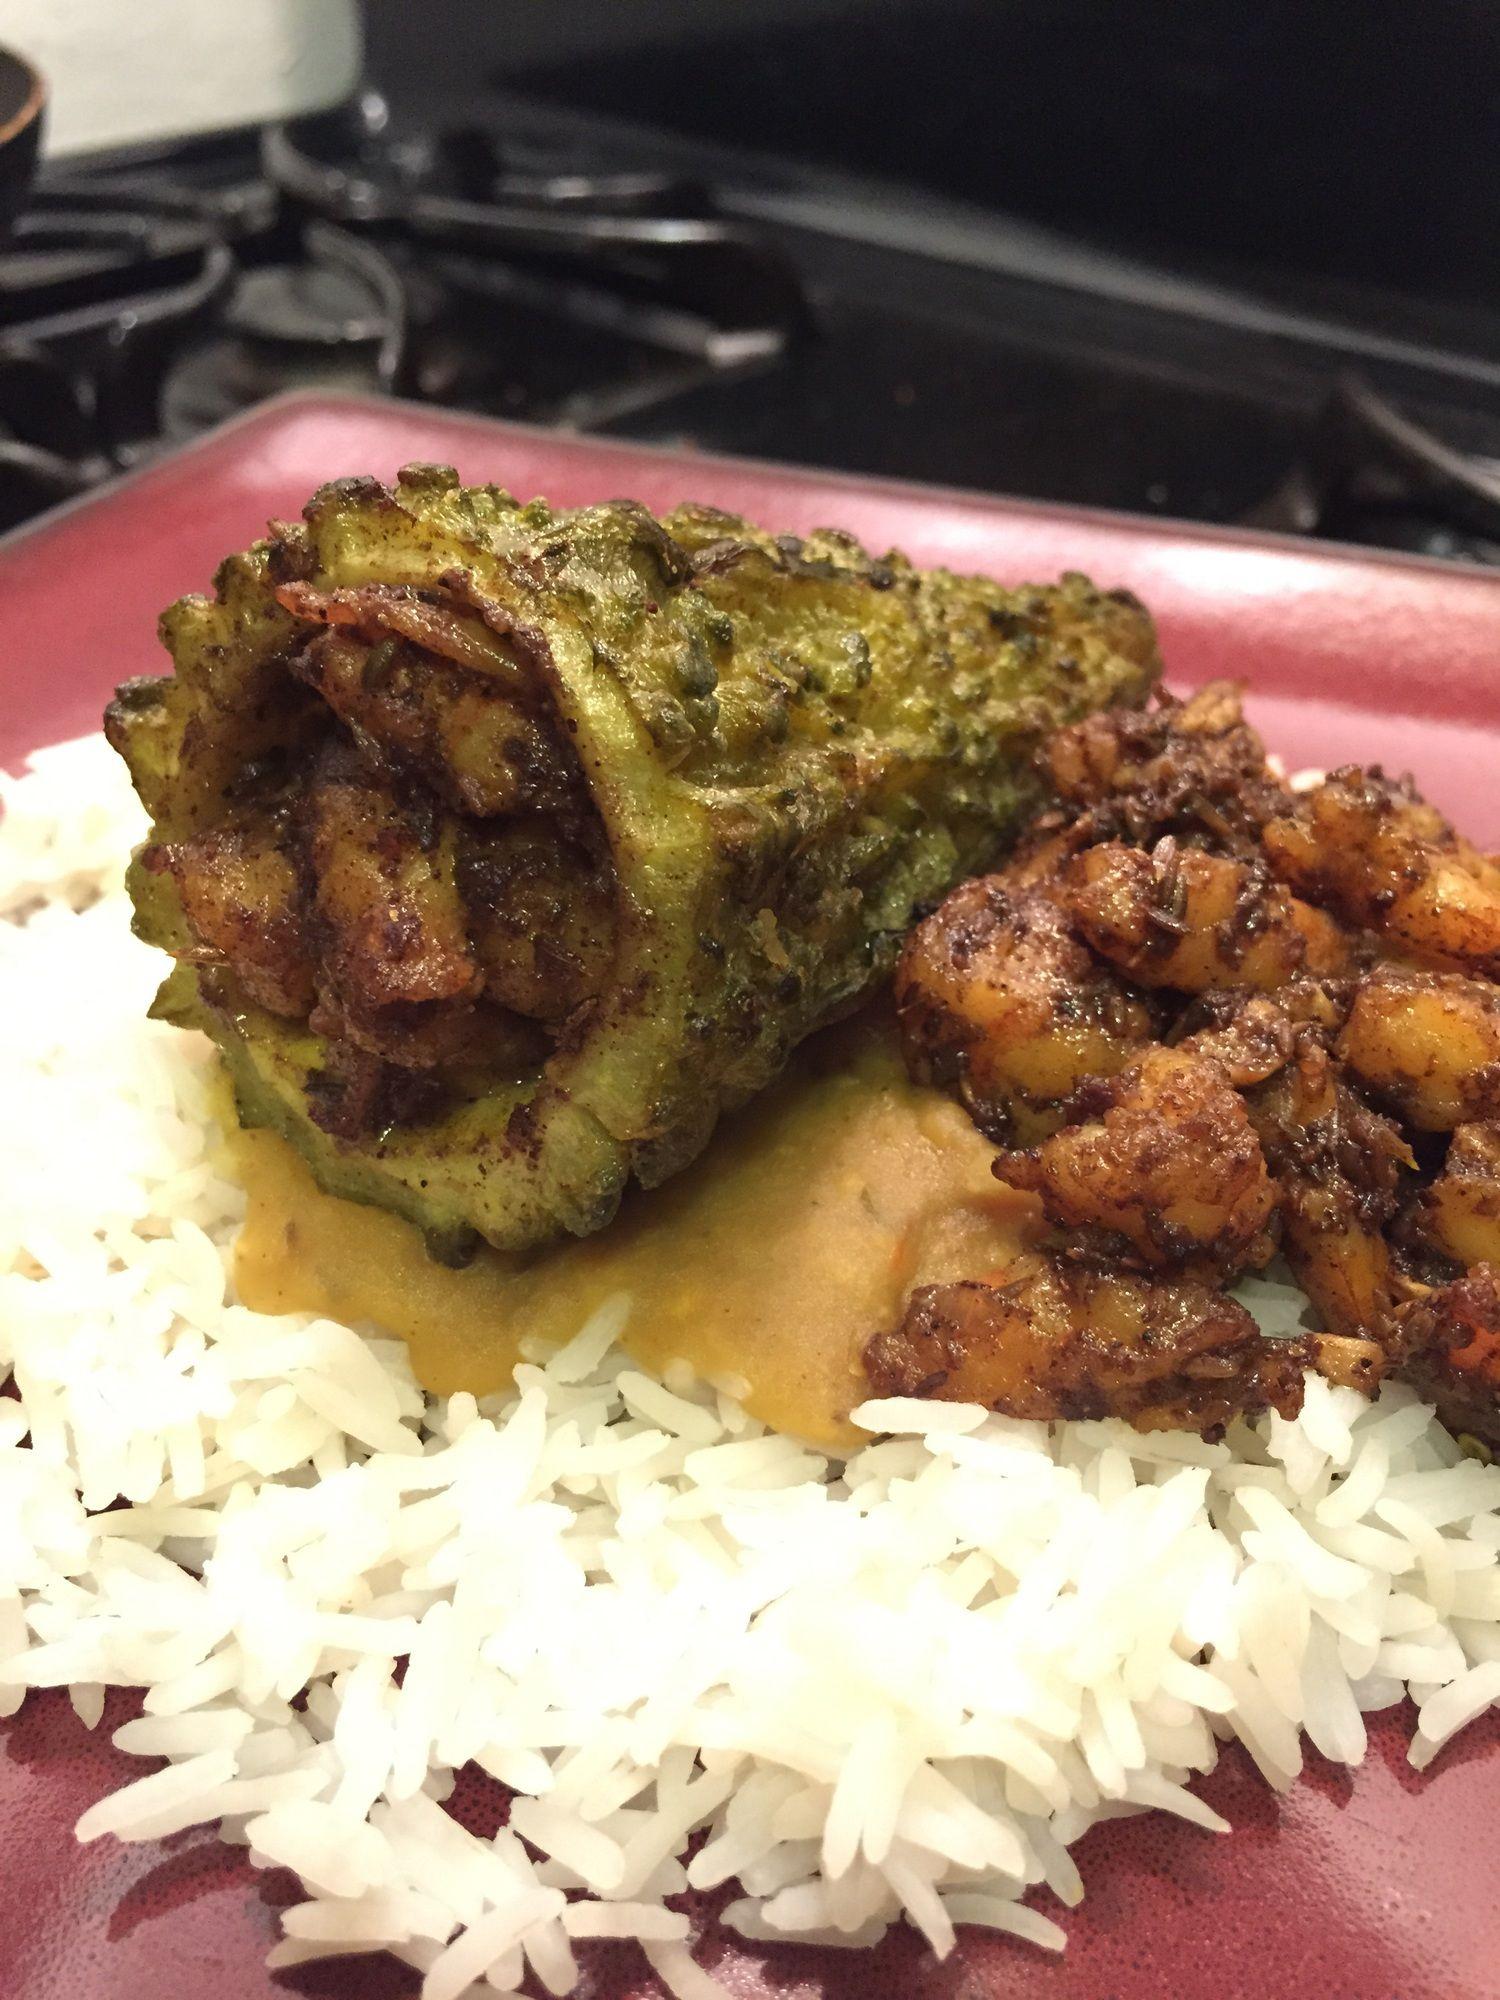 Kalonji with shrimp pinterest meals kitchens and west indian guyanese kalonji with shrimps one of my favorite meals from momw i can make it myself yanasha kitchen forumfinder Choice Image